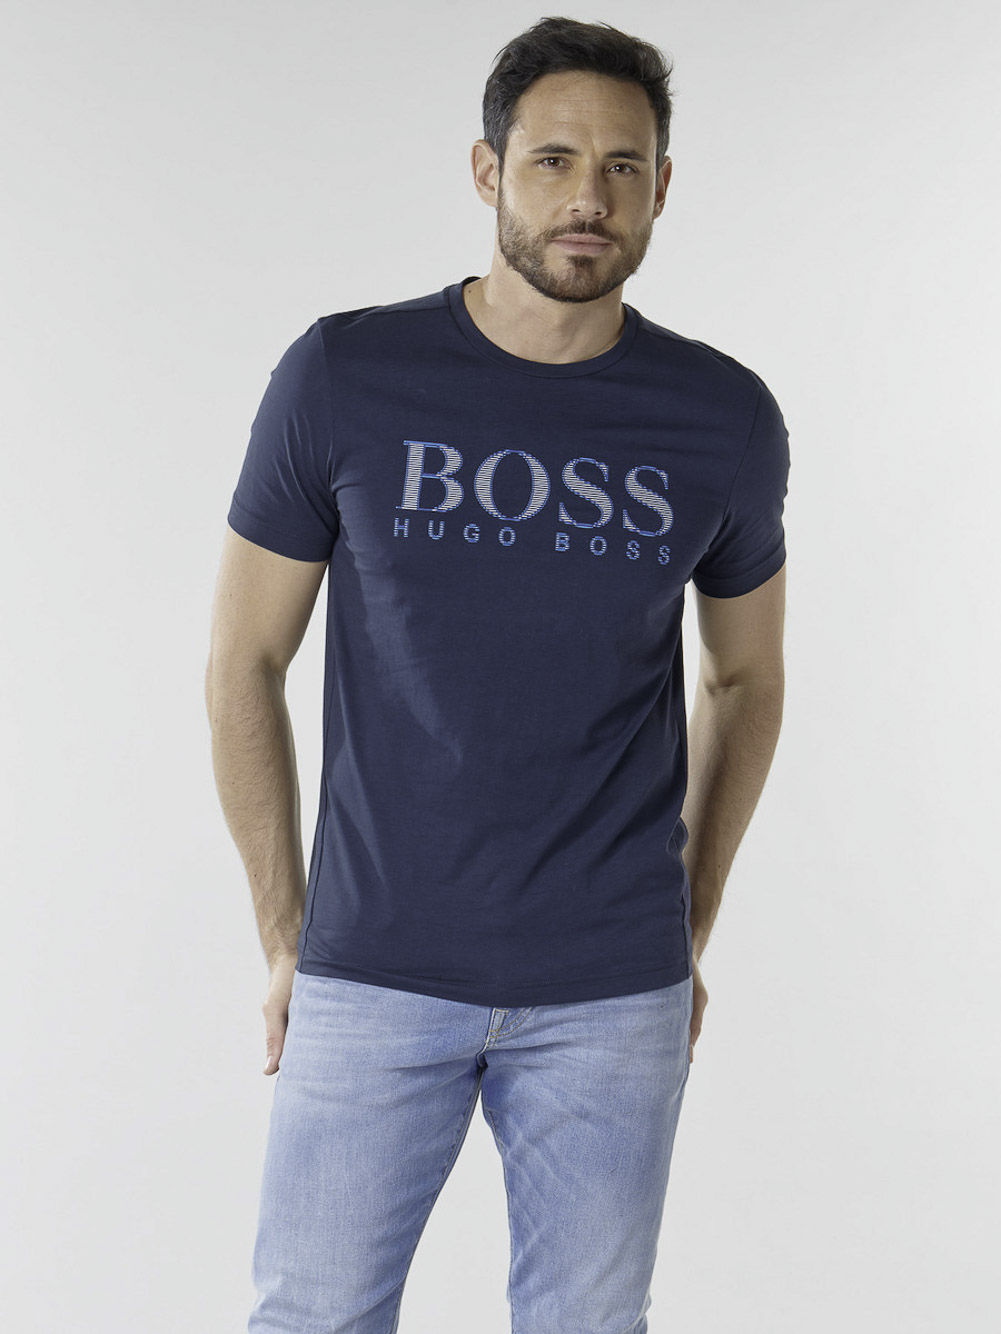 BOSS Μπλούζα t-shirt 50448306-410 ΜΠΛΕ